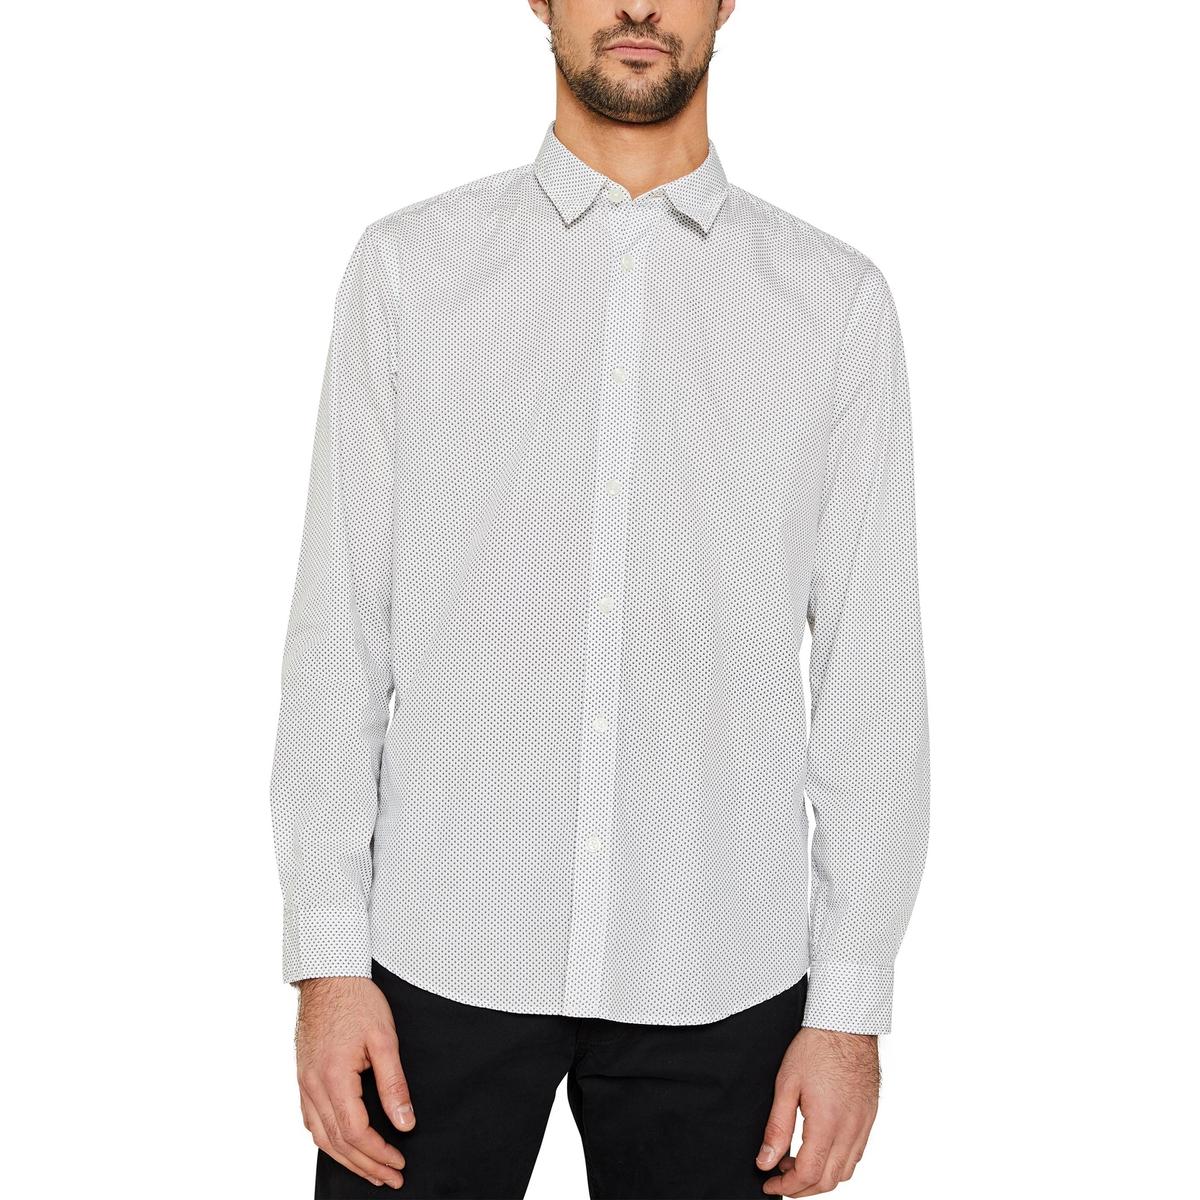 Camisa recta de popelina, estampada